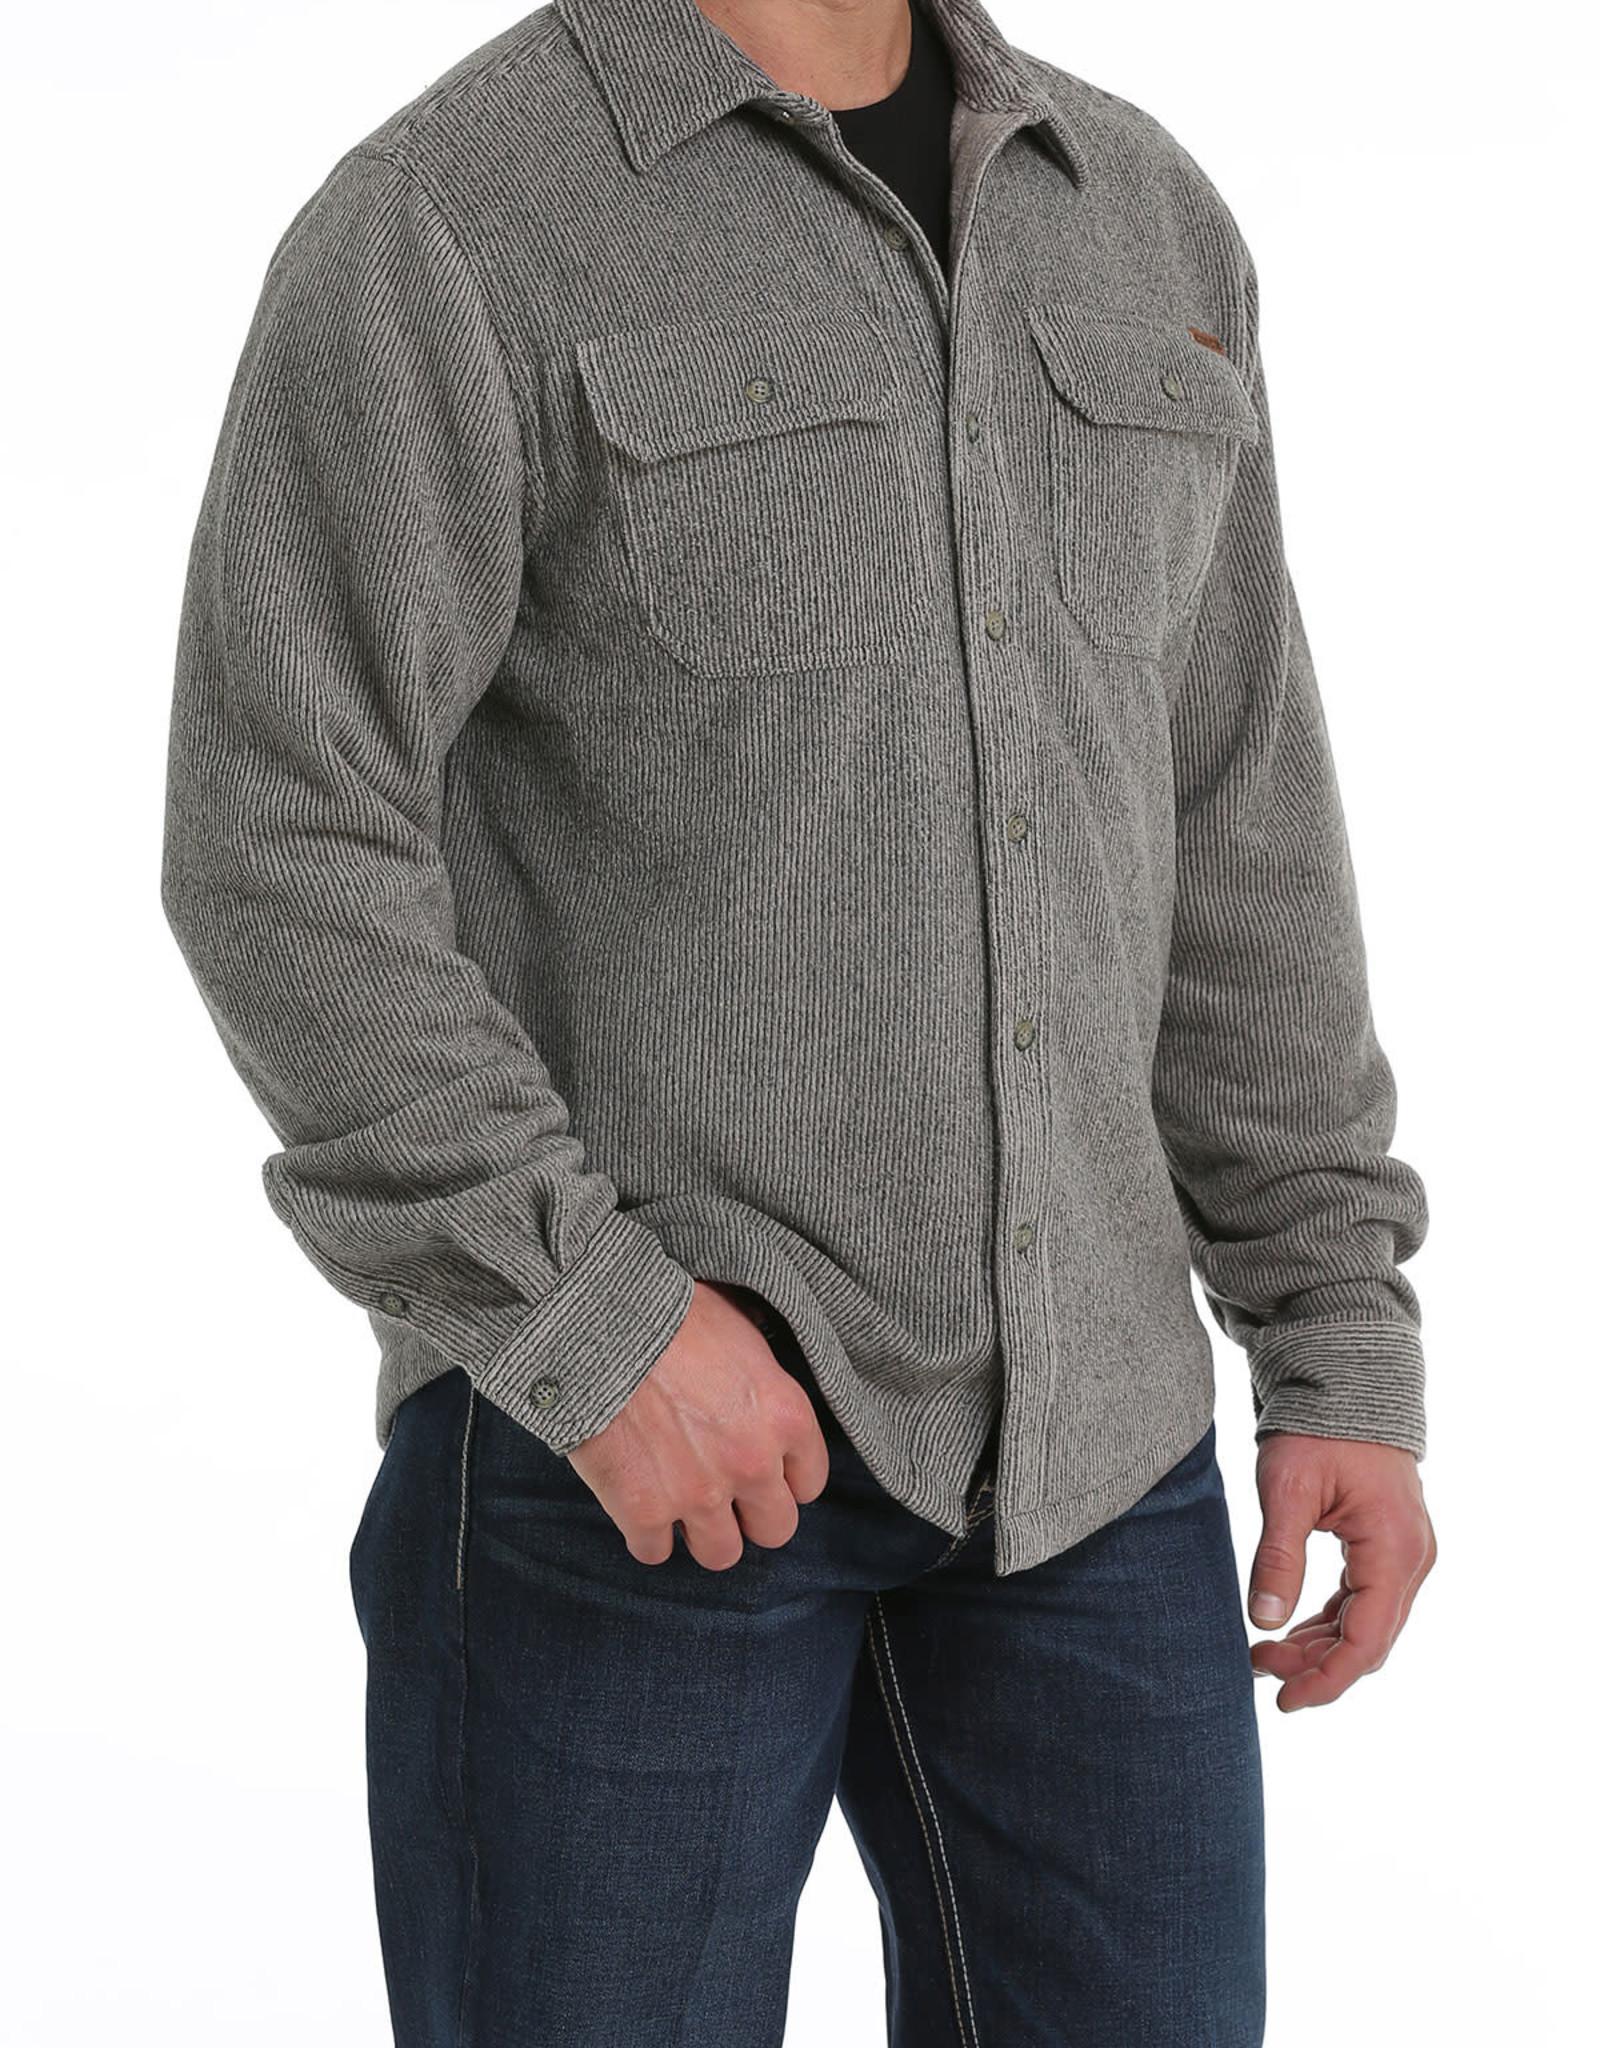 Cinch Mens Cinch Khaki Fleece Shirt Jacket